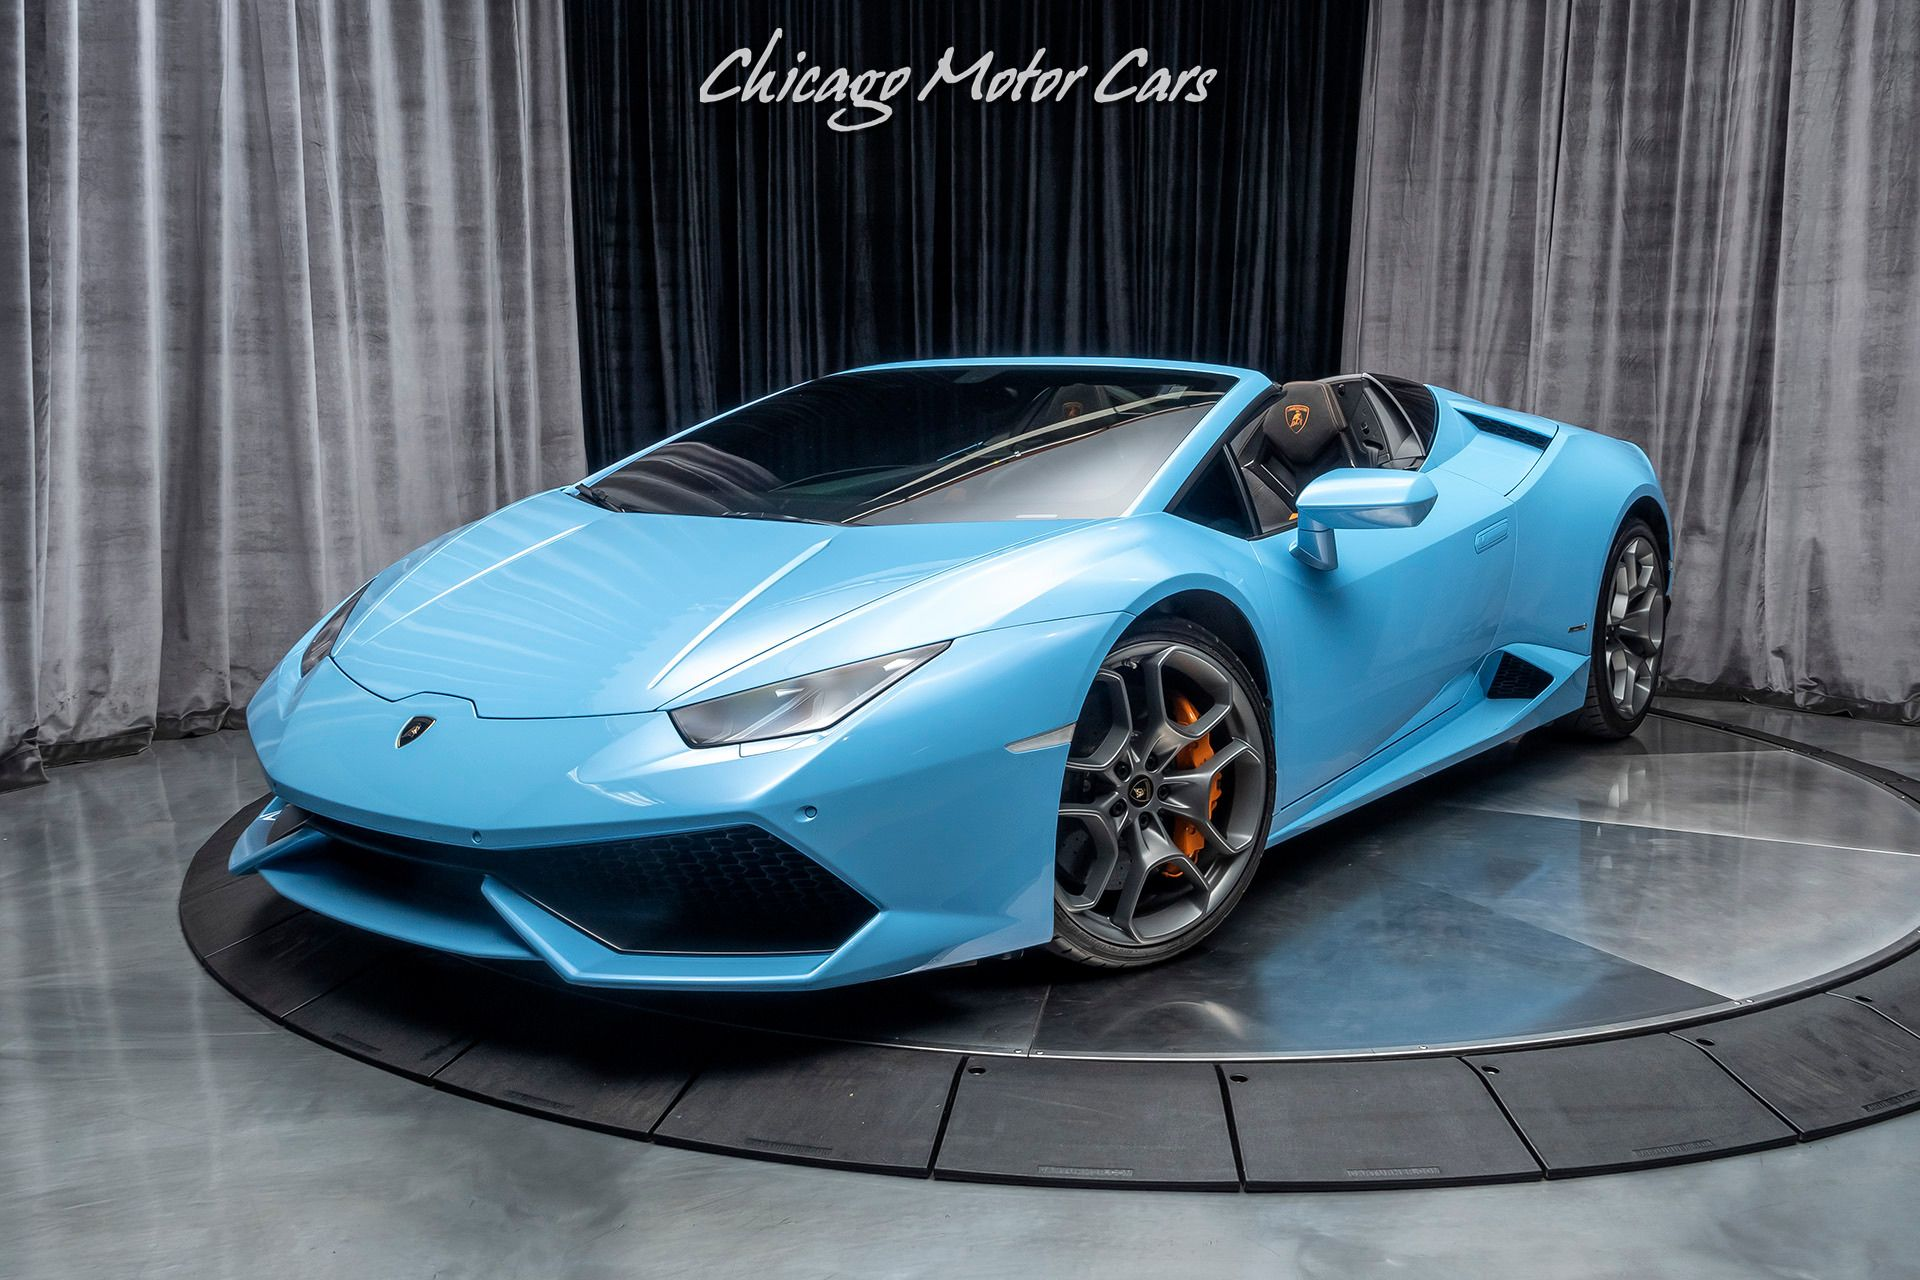 For Sale 2016 Lamborghini Huracan Lp610 4 Spyder Chicago Motor Cars United States For Sale On Luxuryp Super Luxury Cars Lamborghini Huracan Lamborghini